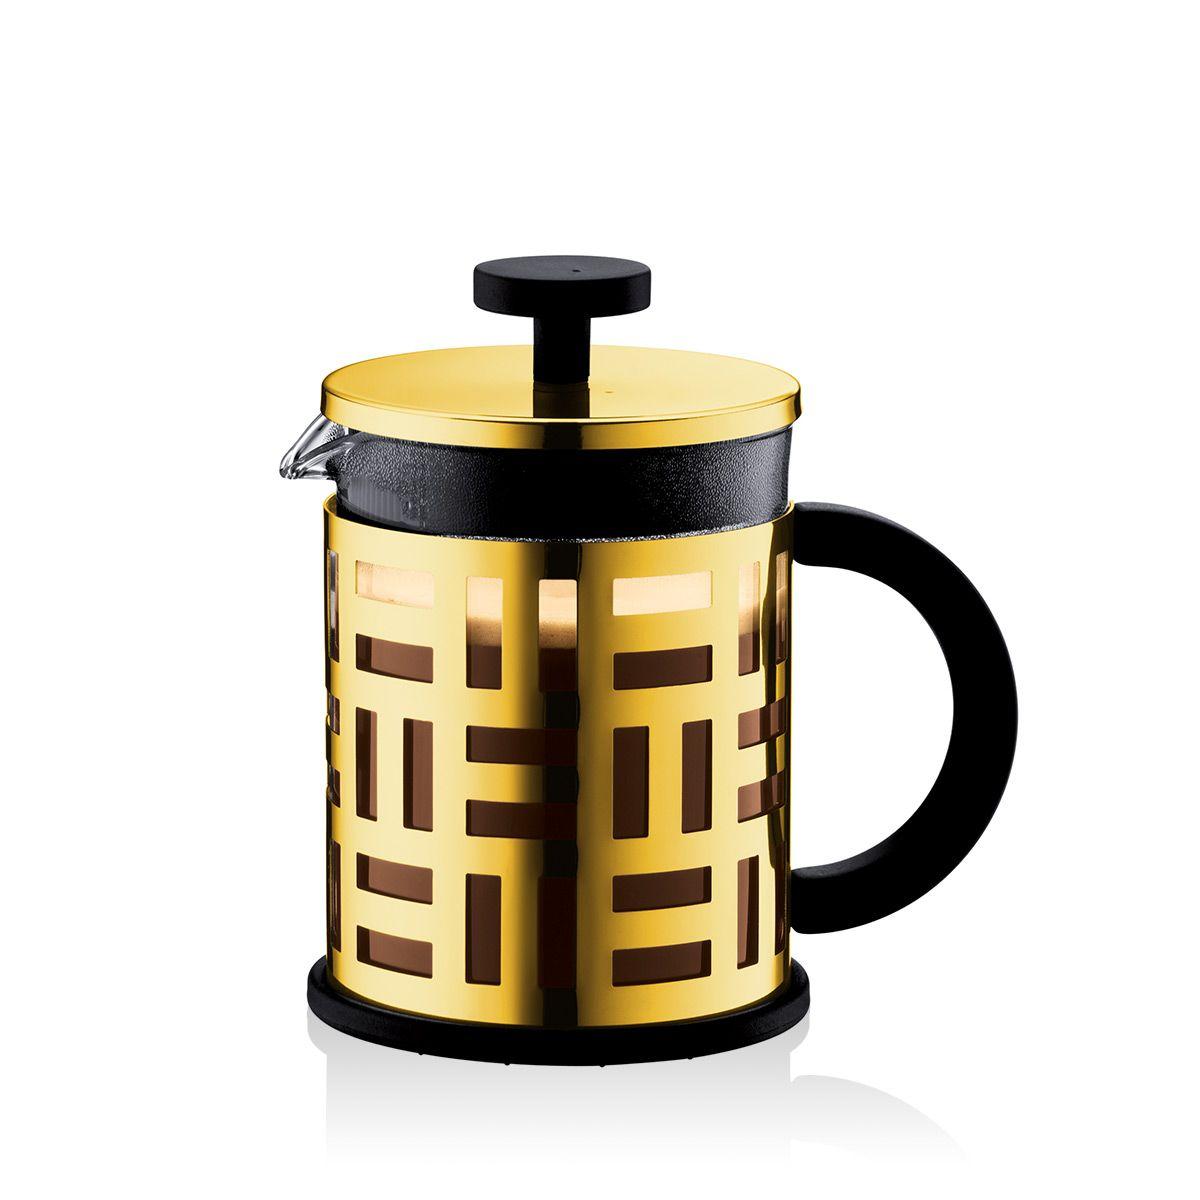 French Press Coffee Maker Eileen Bodum